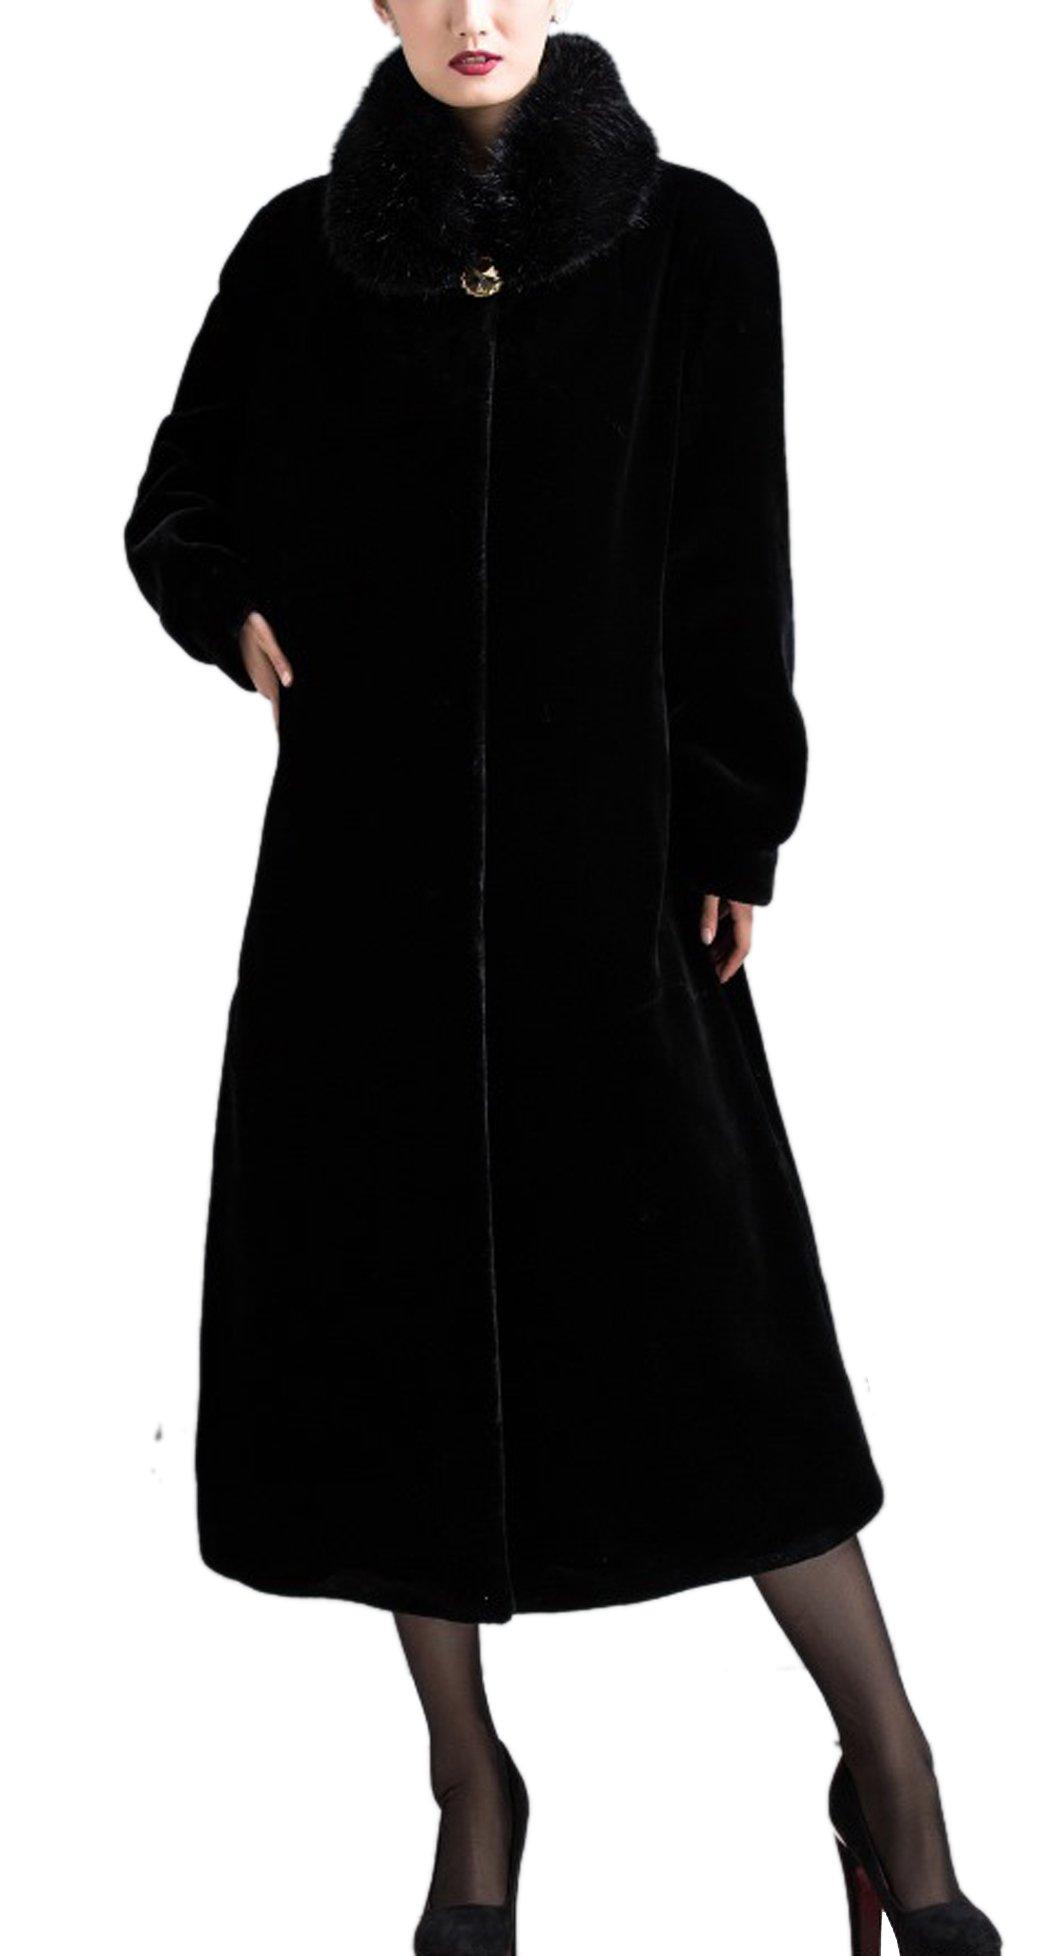 Women's Black Maxi Length Faux Mink Fur Coat Long Sleeve Winter Outerwear 3XL